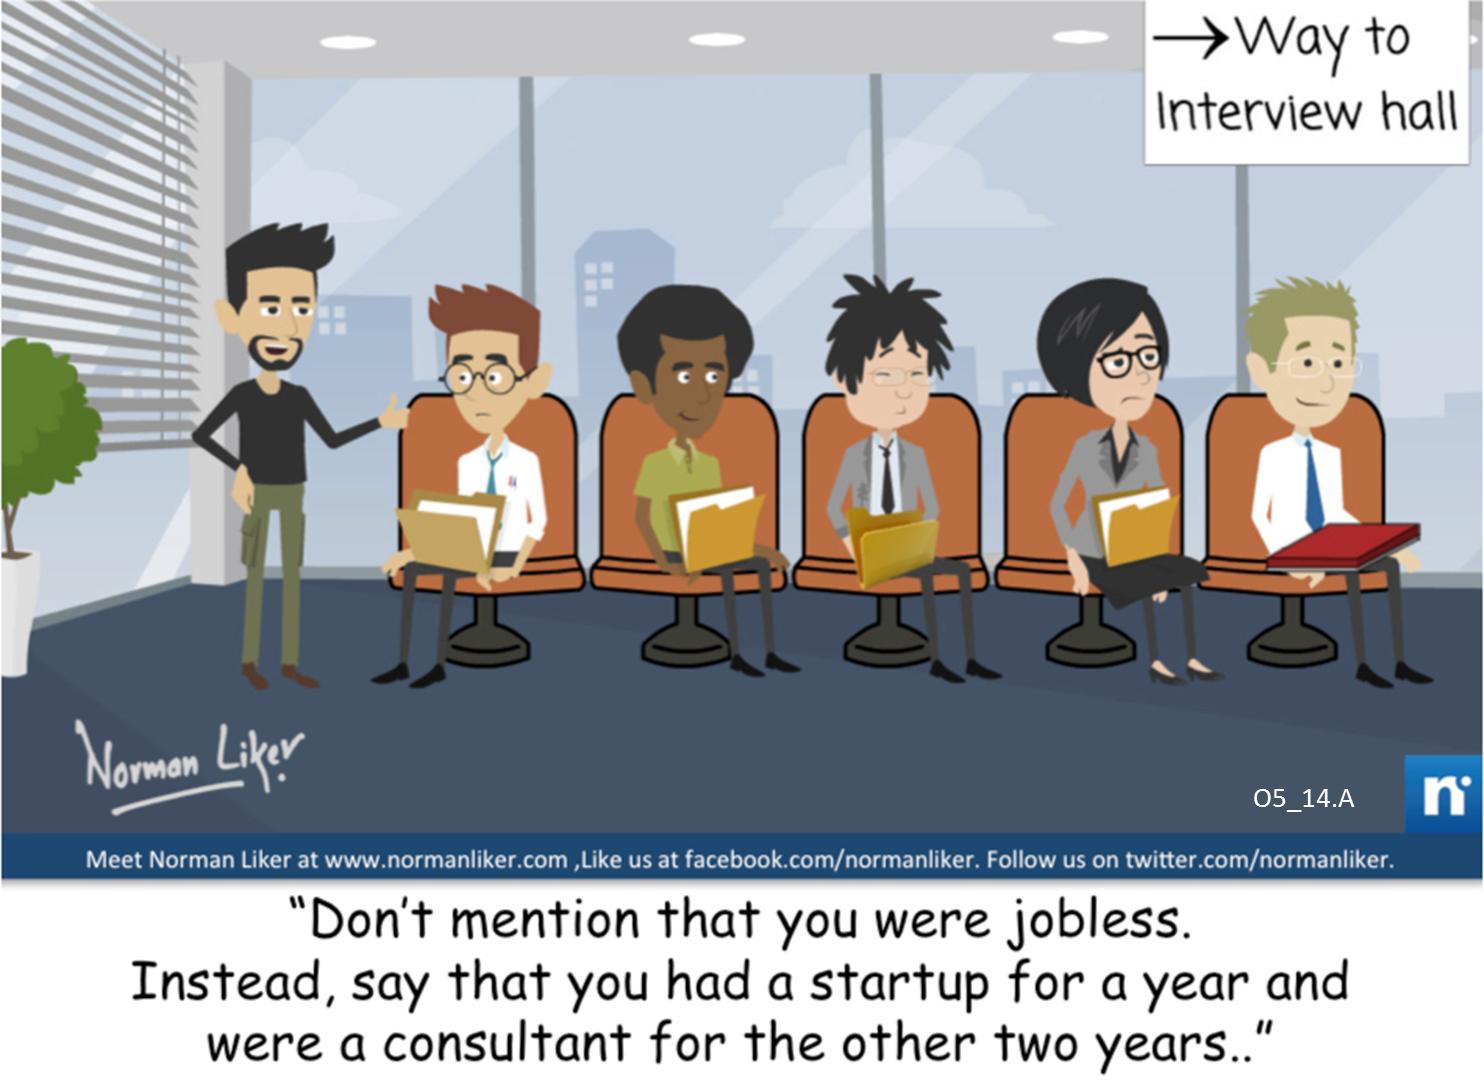 Office Comics: Interview Tips